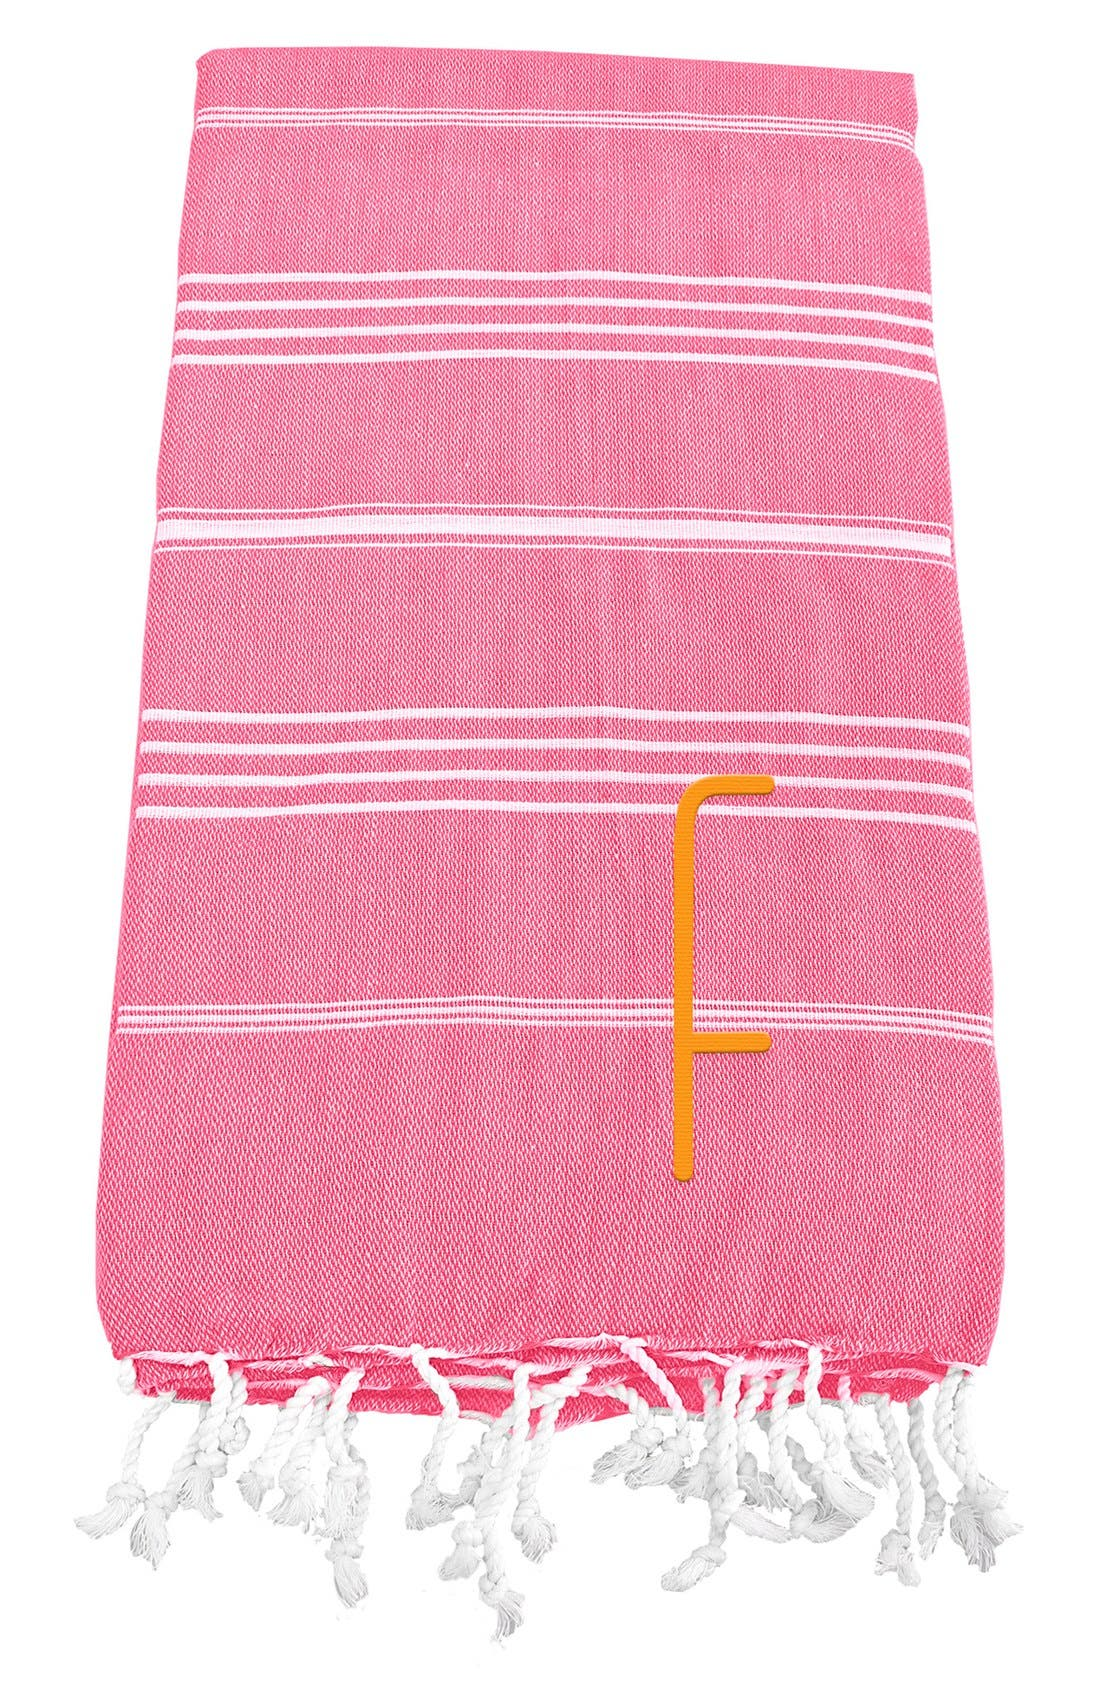 Monogram Turkish Cotton Towel,                             Main thumbnail 142, color,